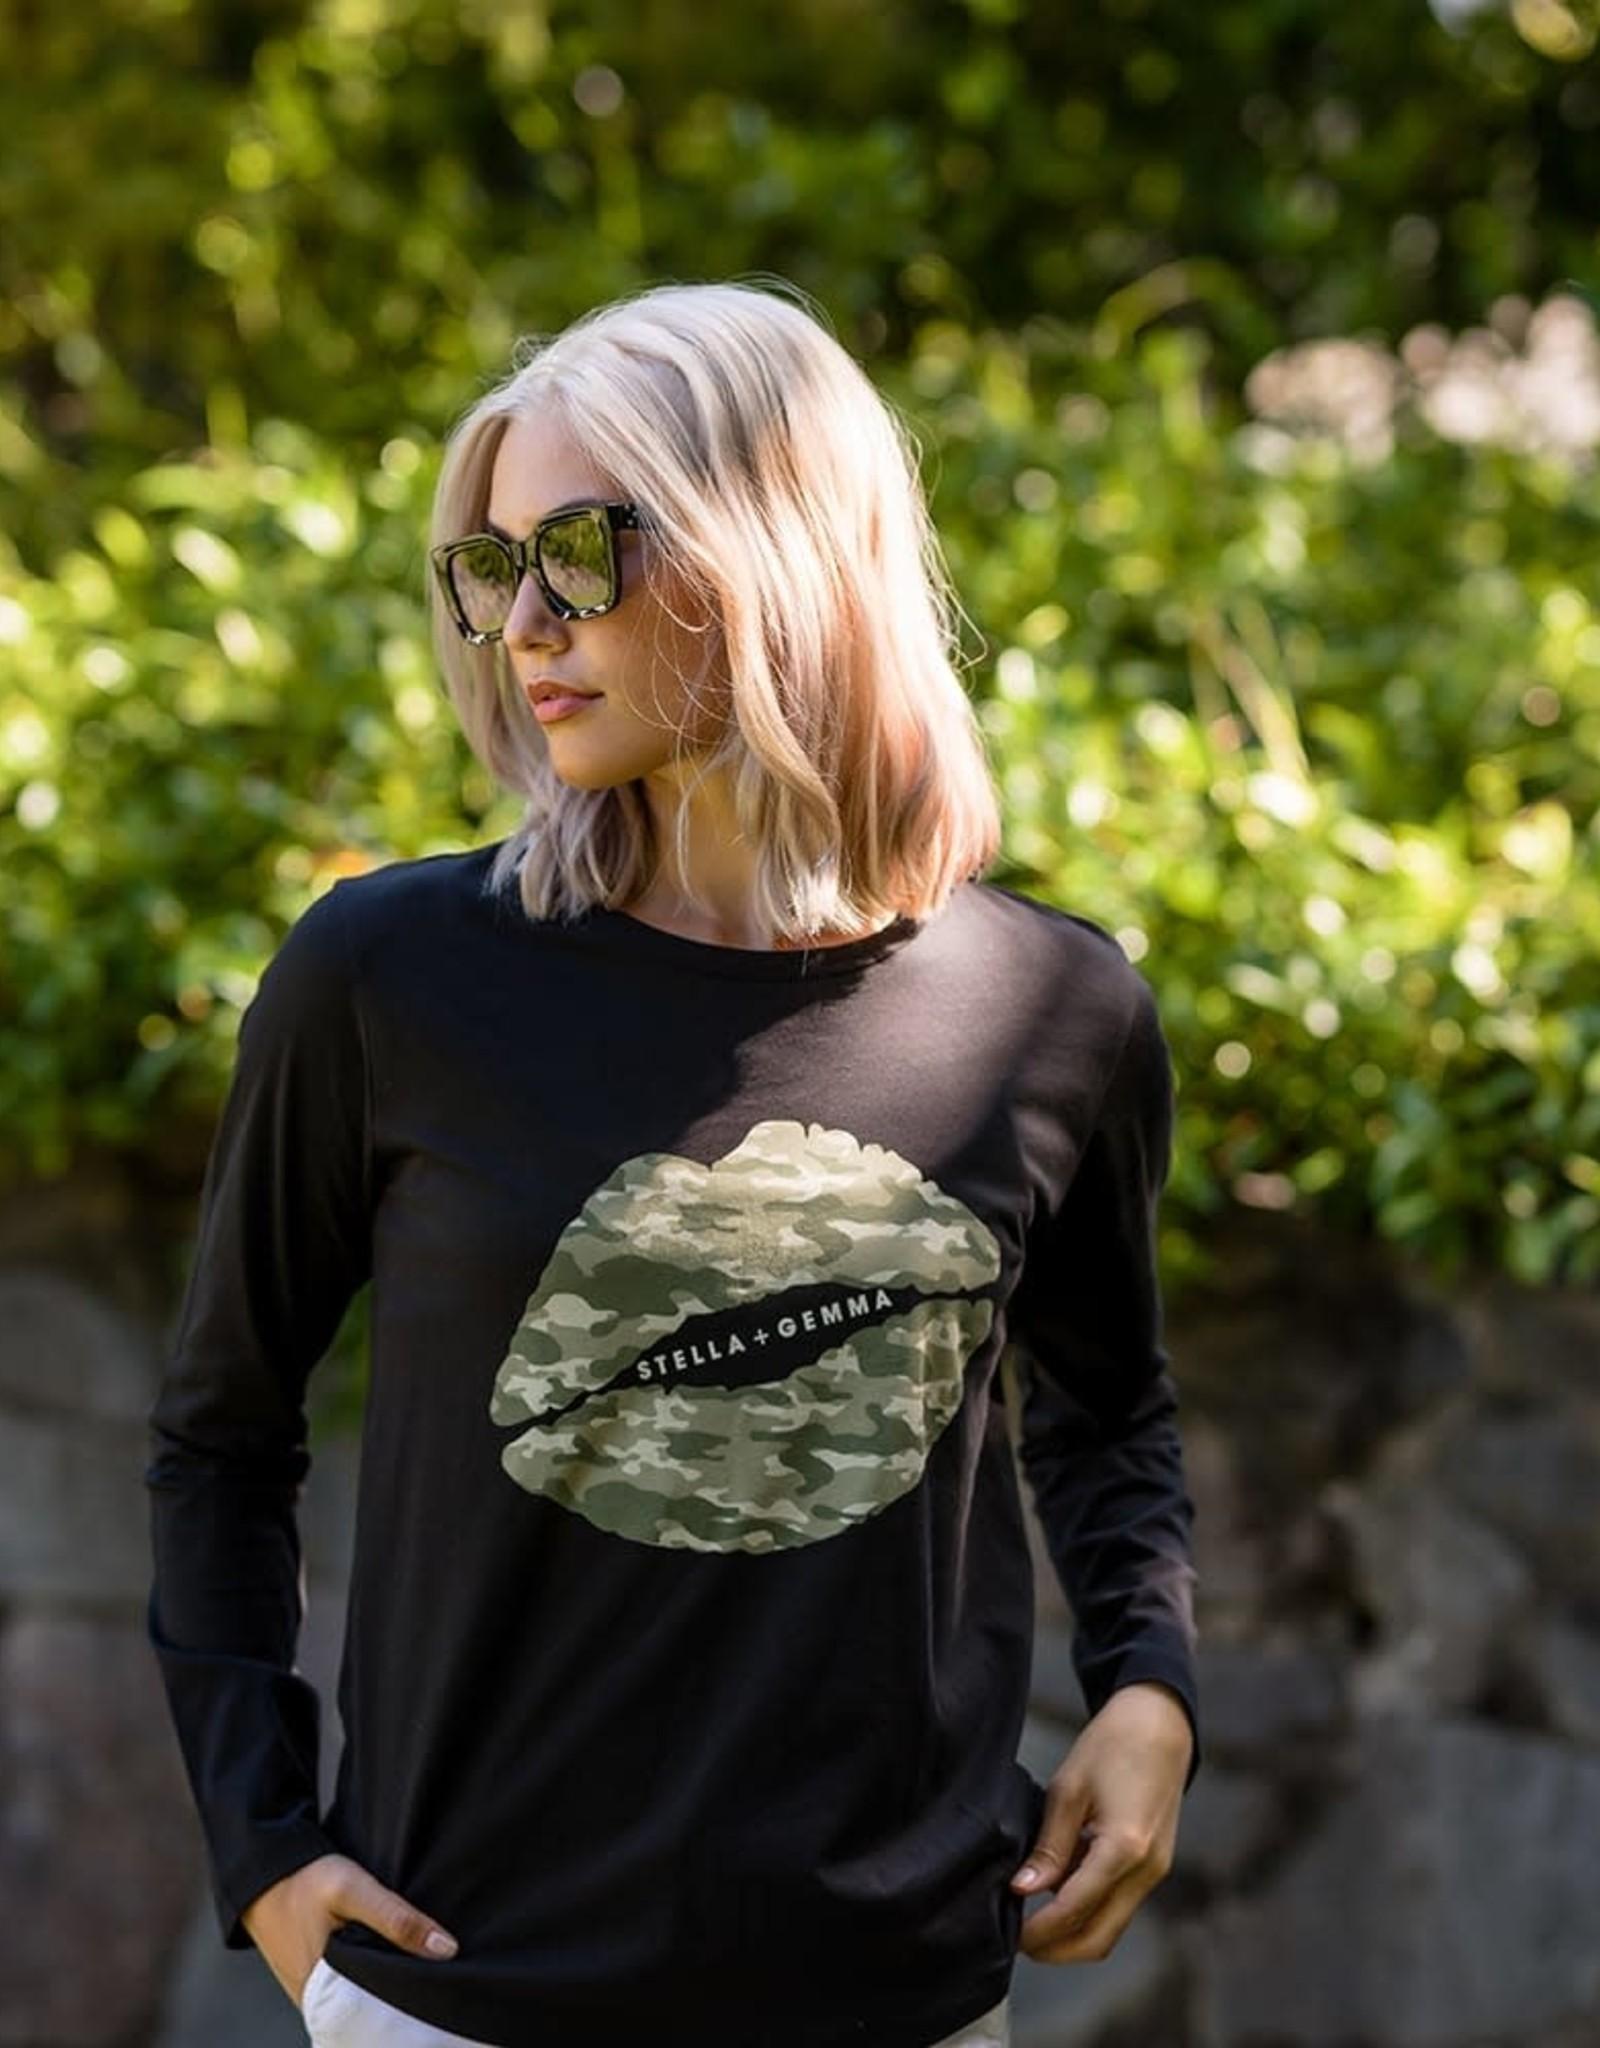 STELLA & GEMMA SGTS3084 Camo Lips Long Sleeve T-Shirt